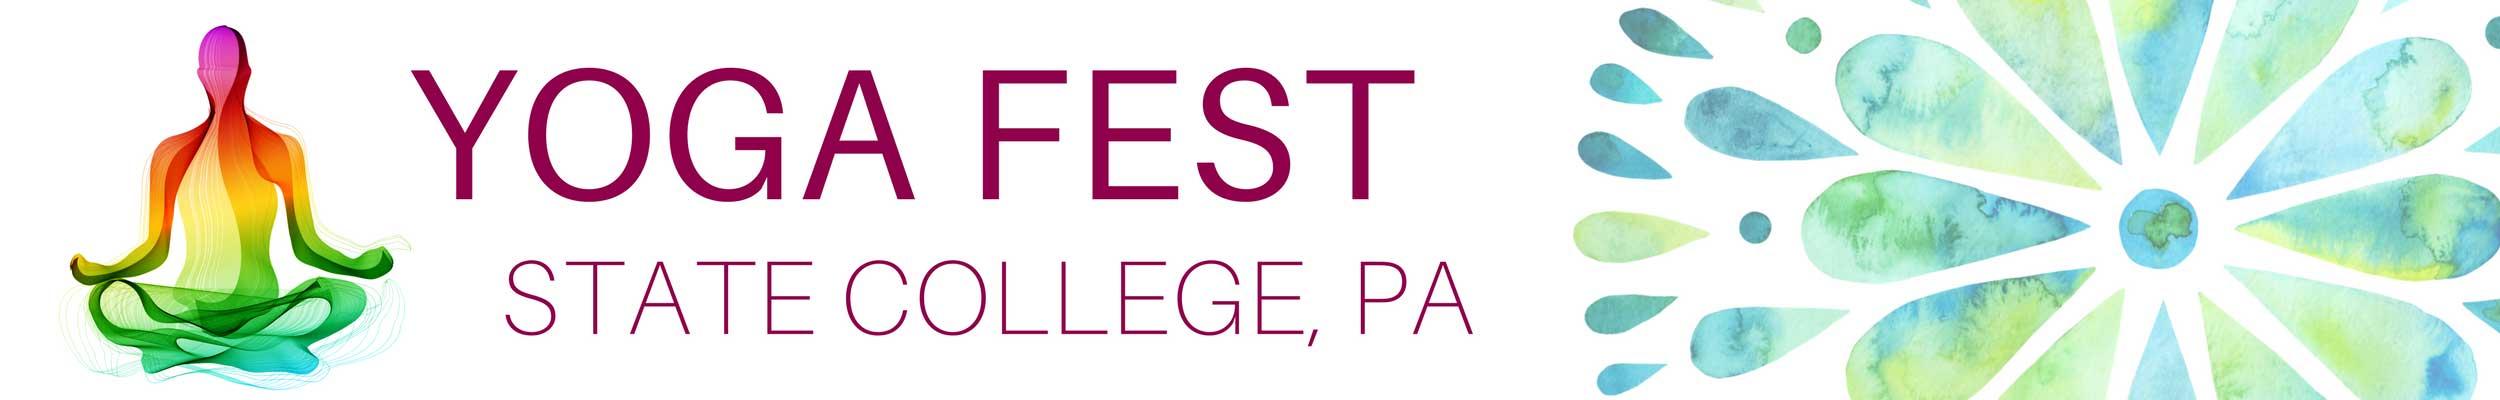 Yoga Fest State College